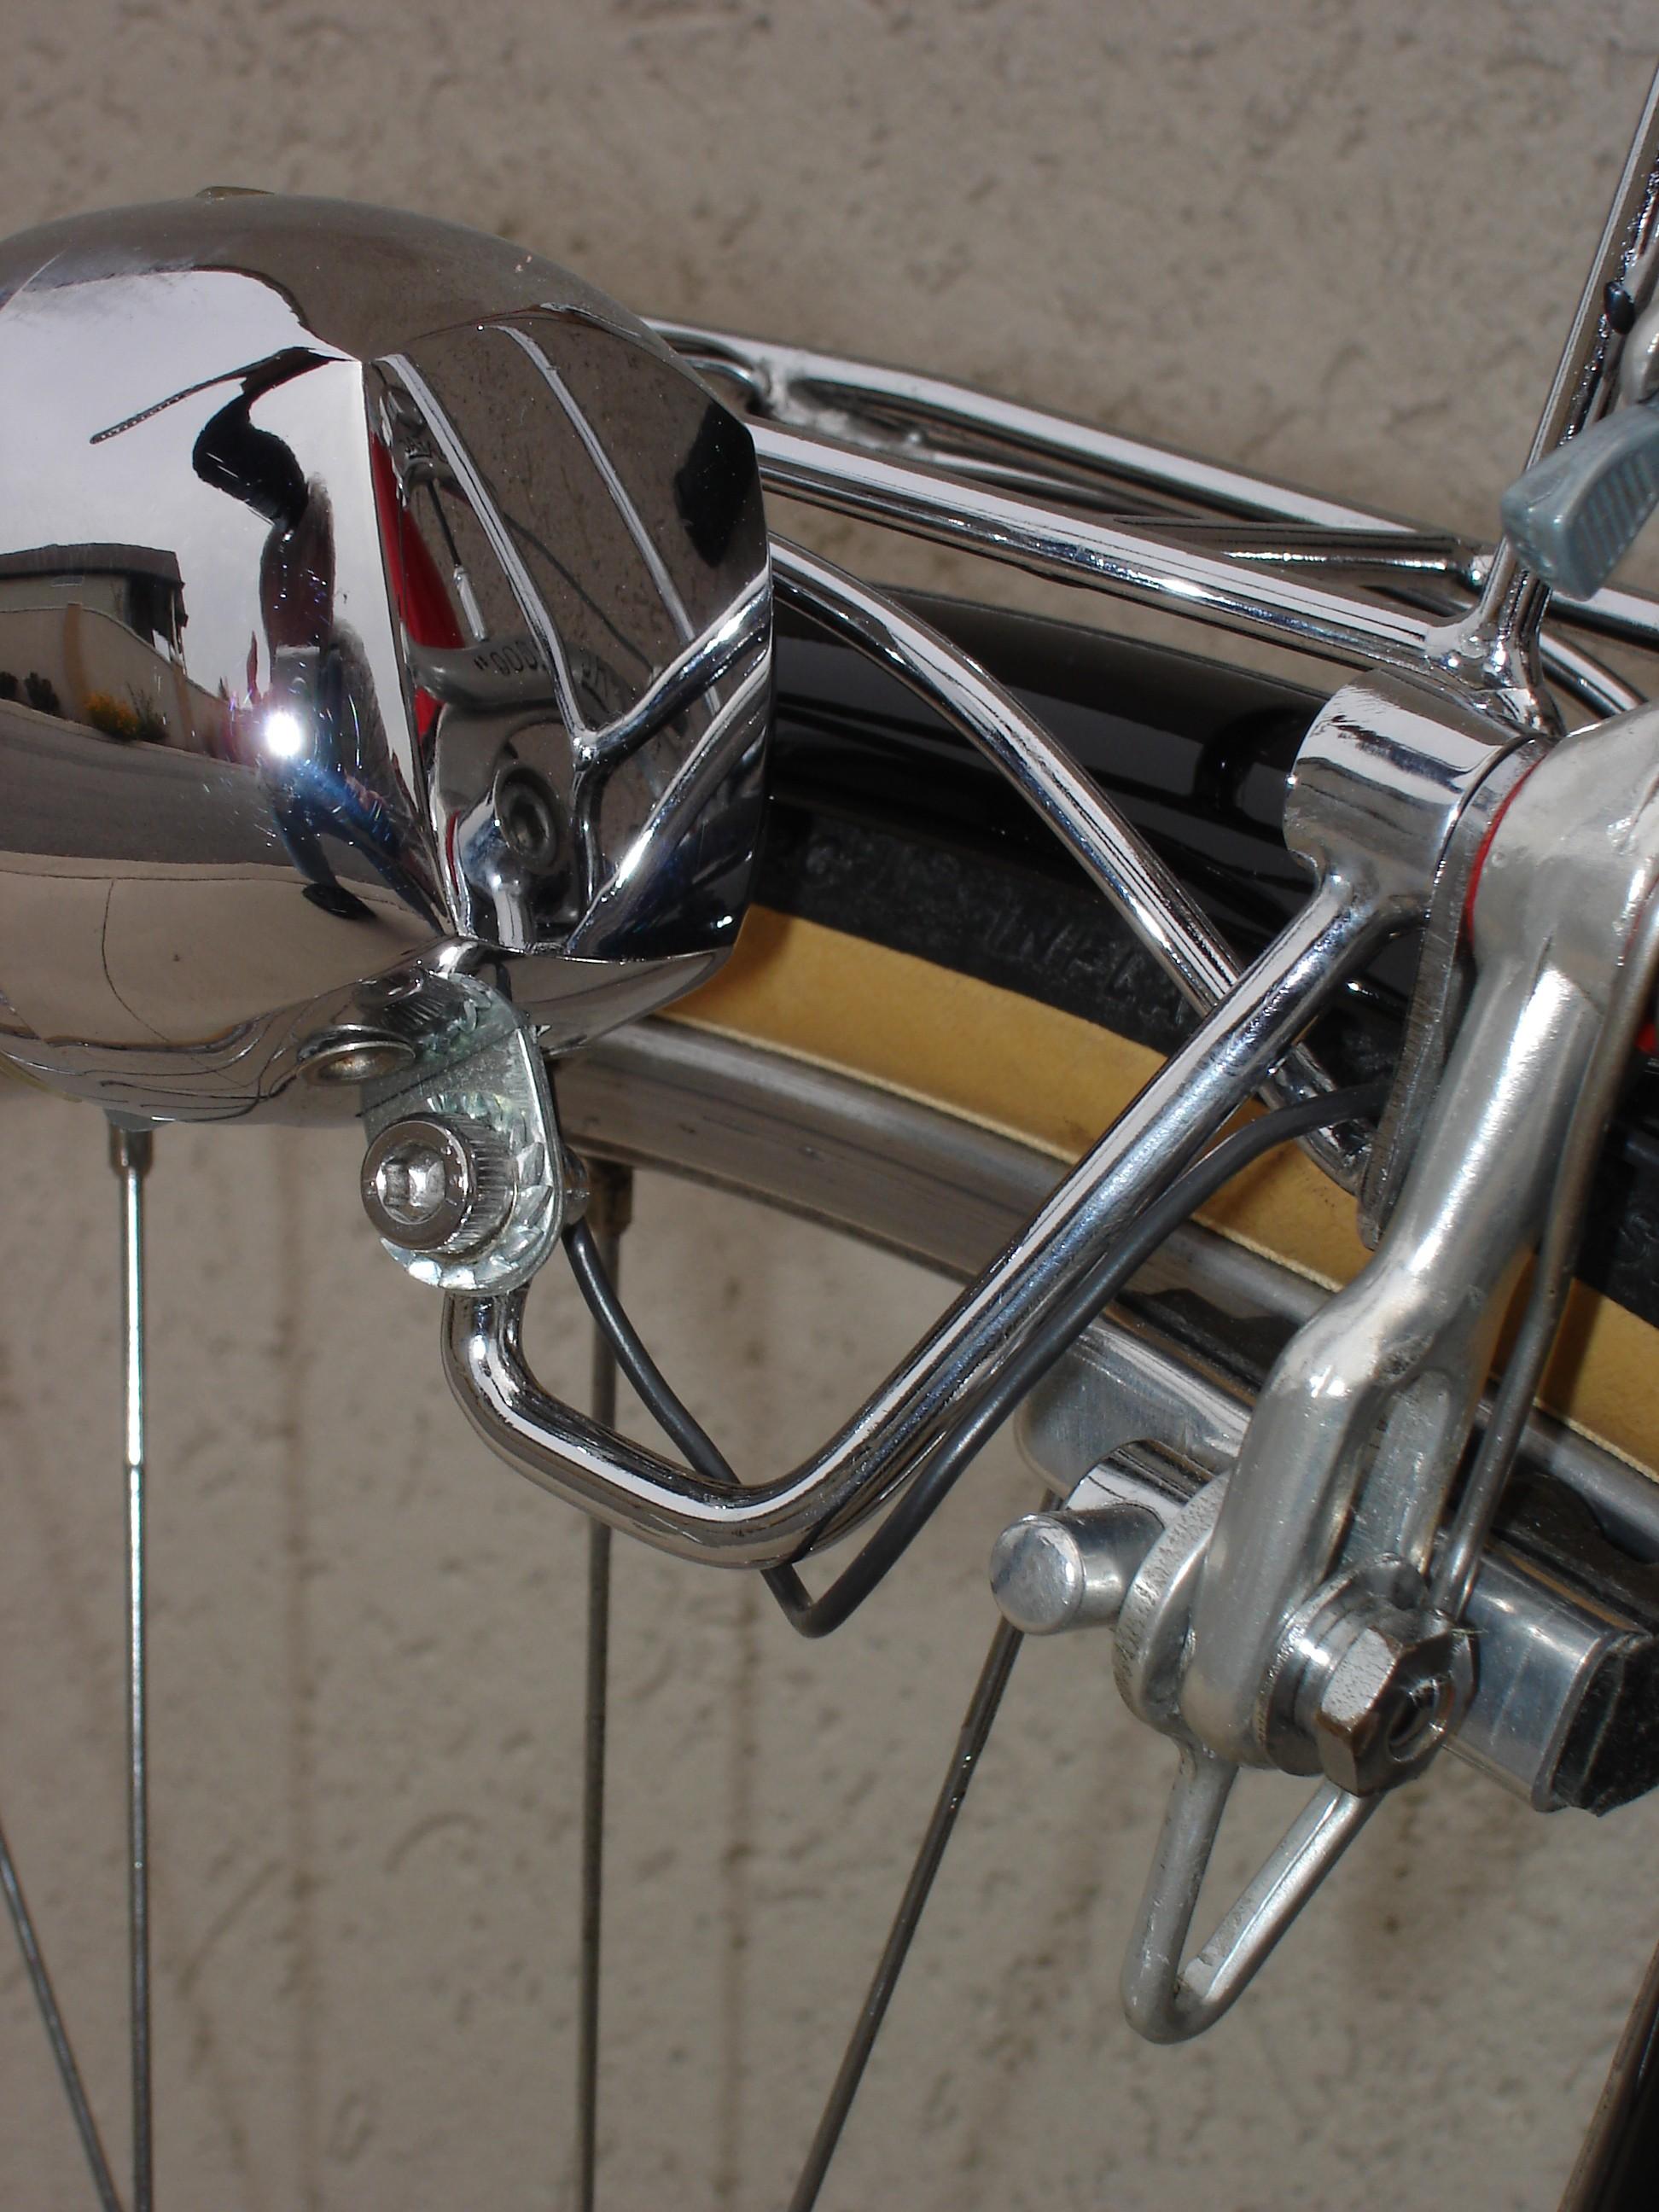 Led Conversion For Dynamo Driven Bike Lights Bertin Classic Cycles